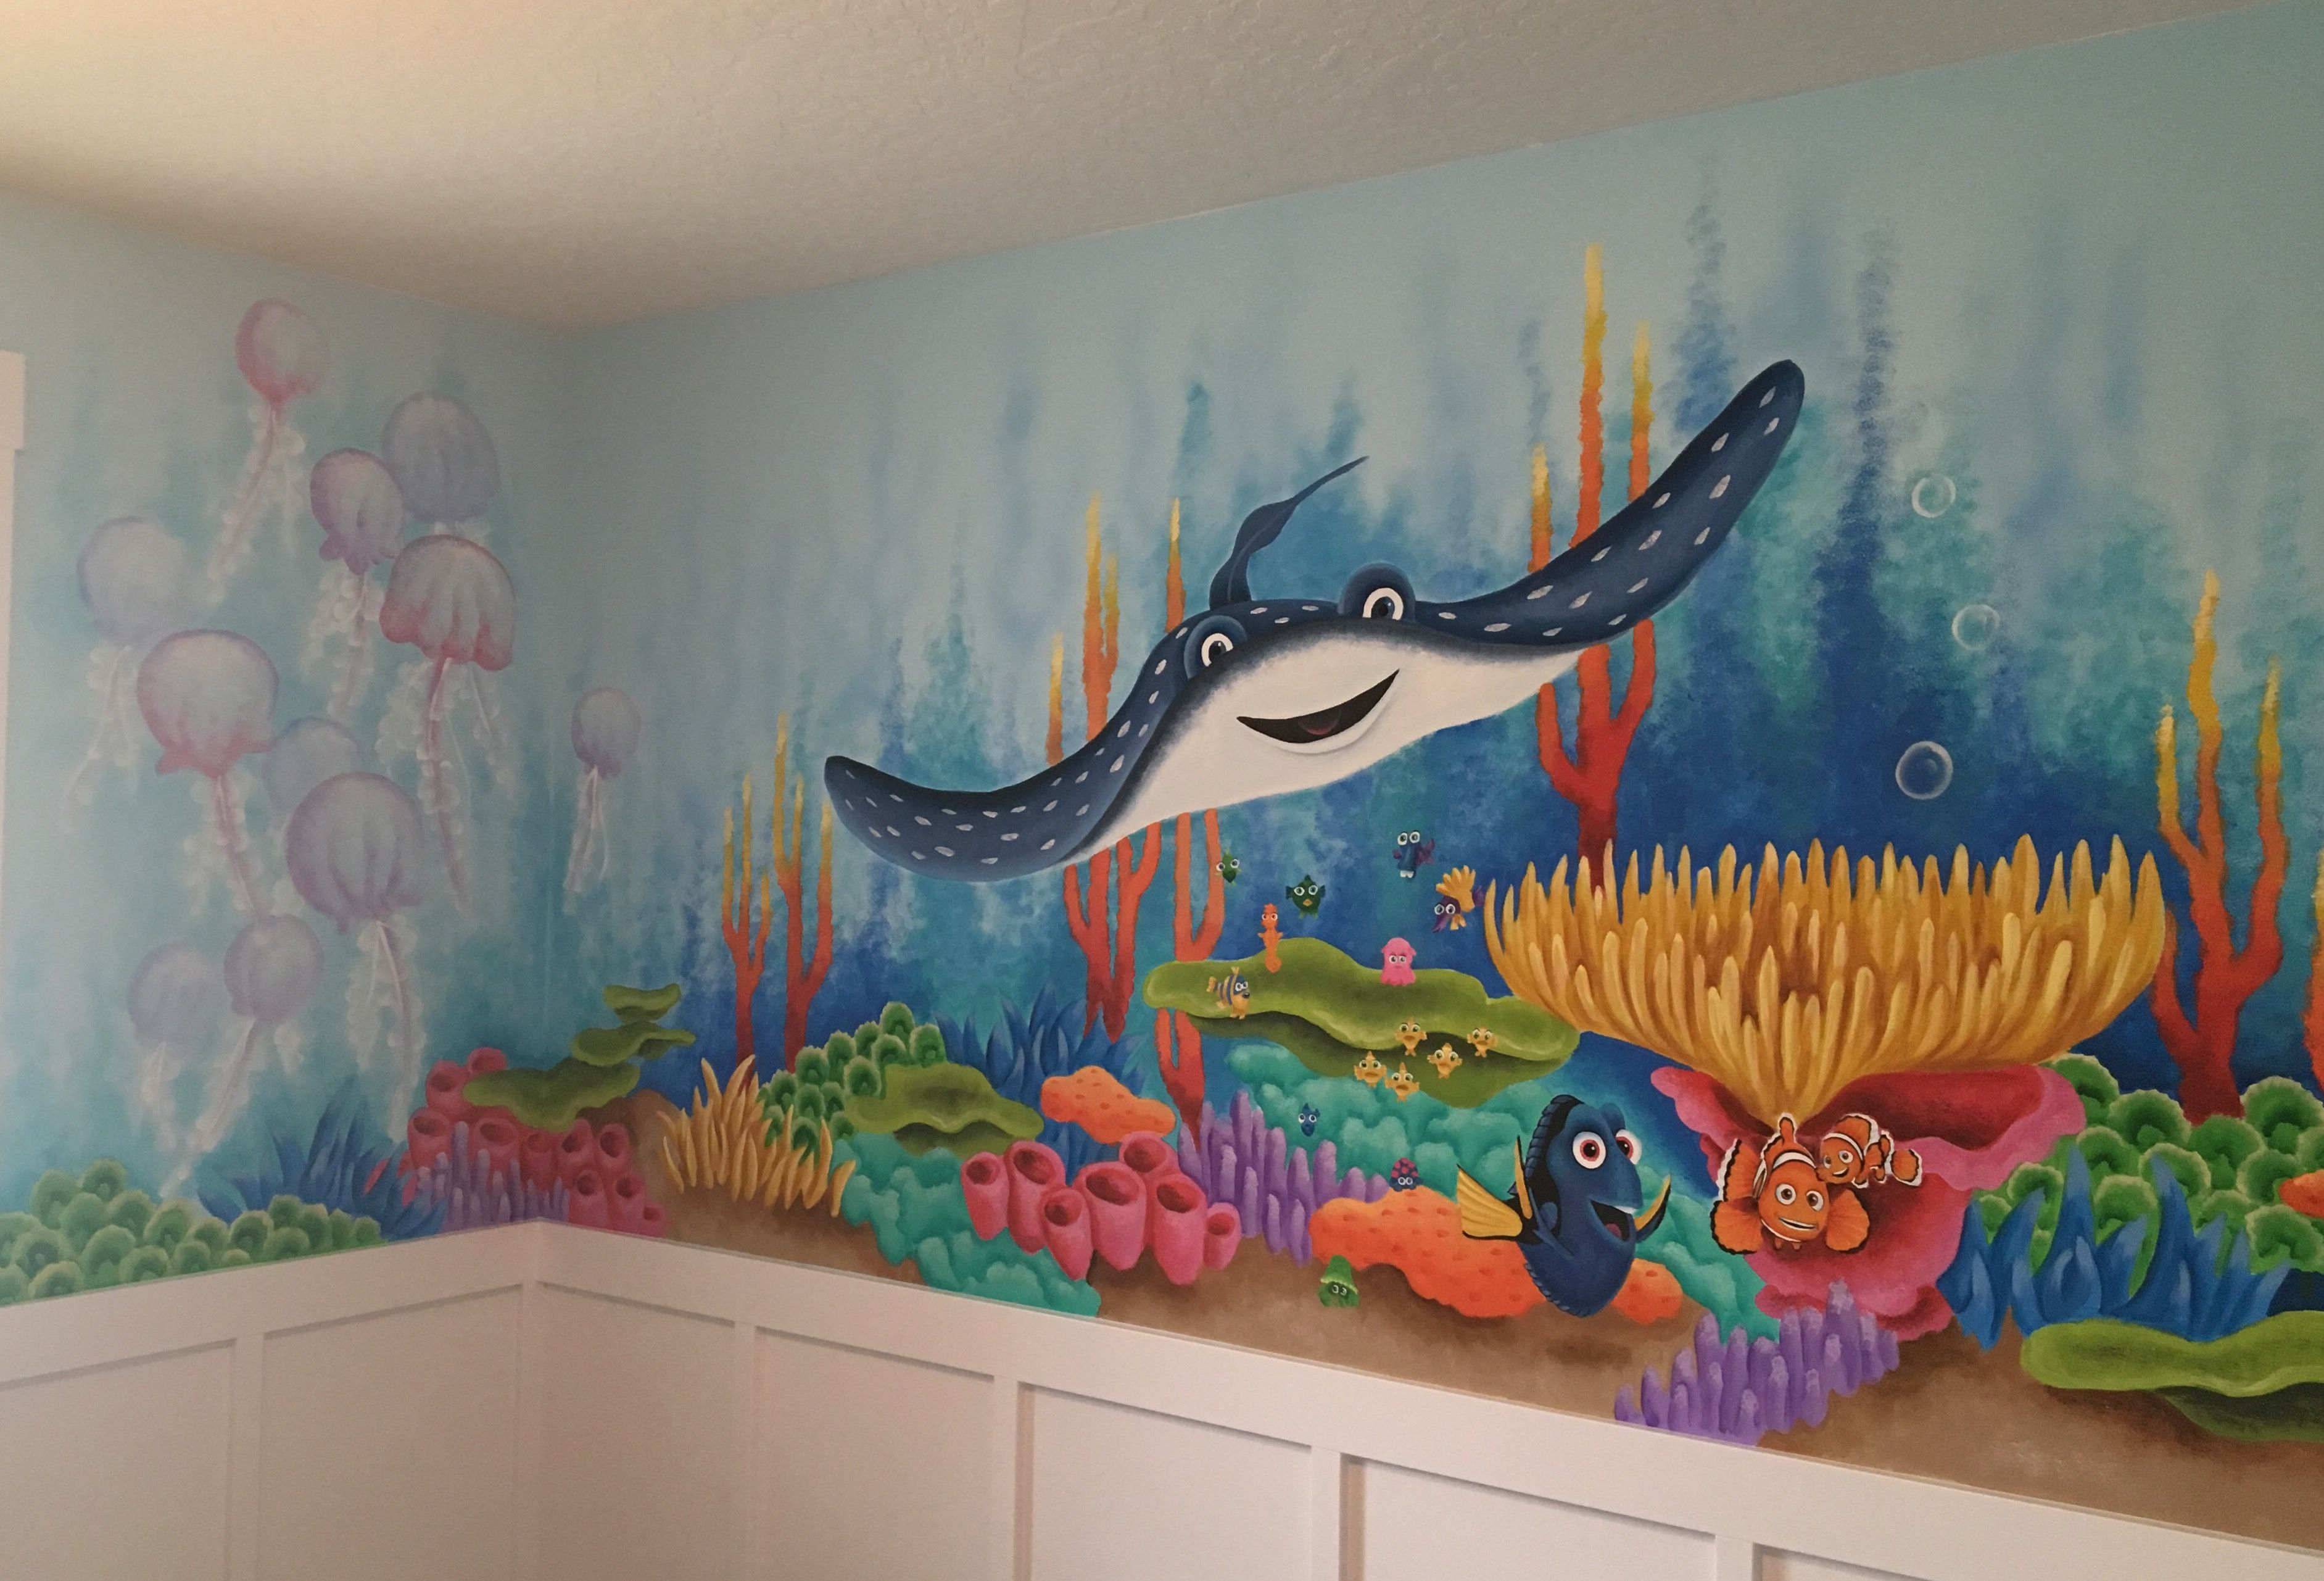 Murales Cameretta Bambini : Camerette dei sogni sd art superfici d autore murales dipinti